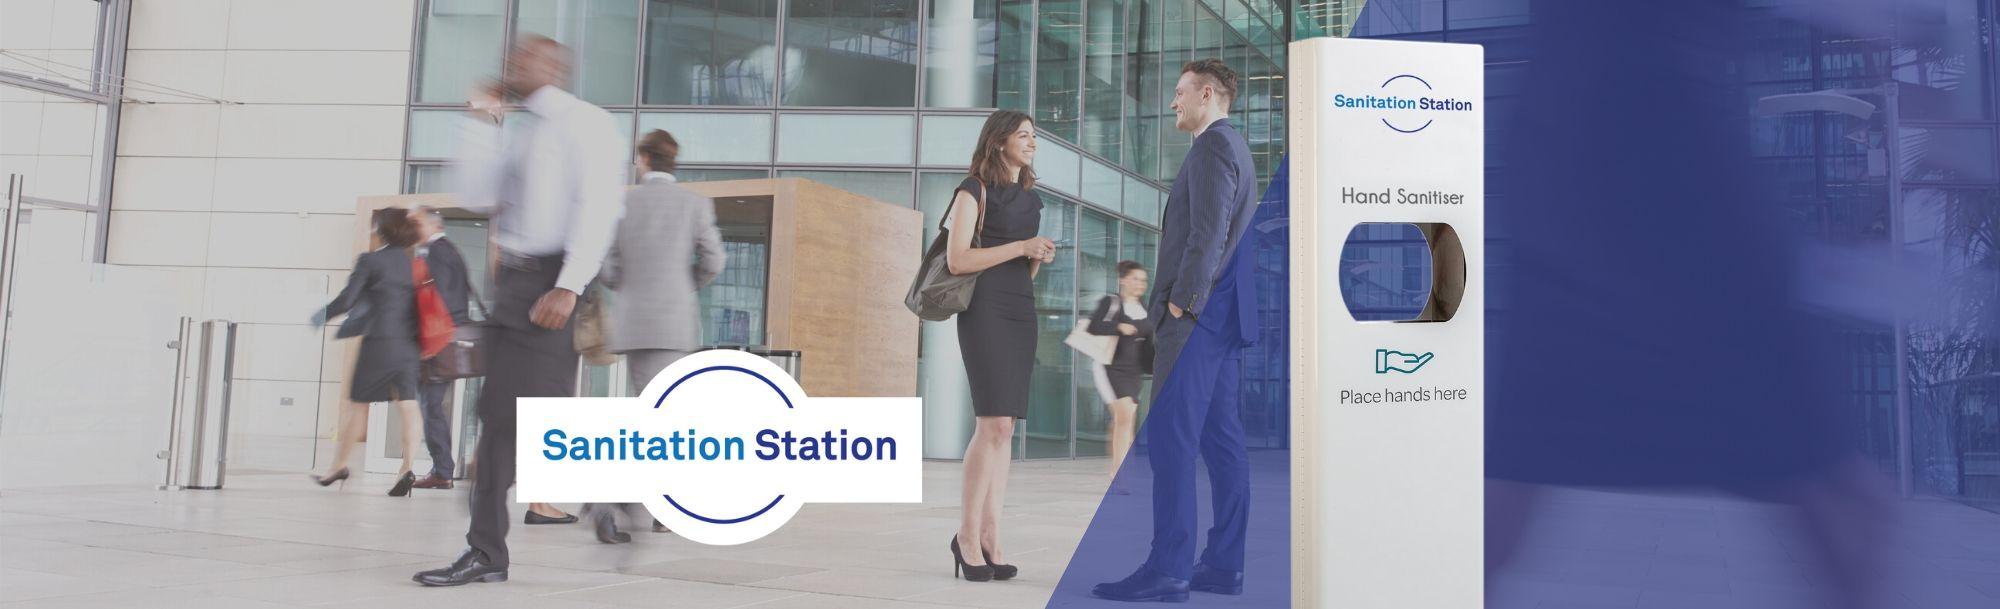 Automatic Hand Sanitiser Dispenser Stand | Sanitation Station